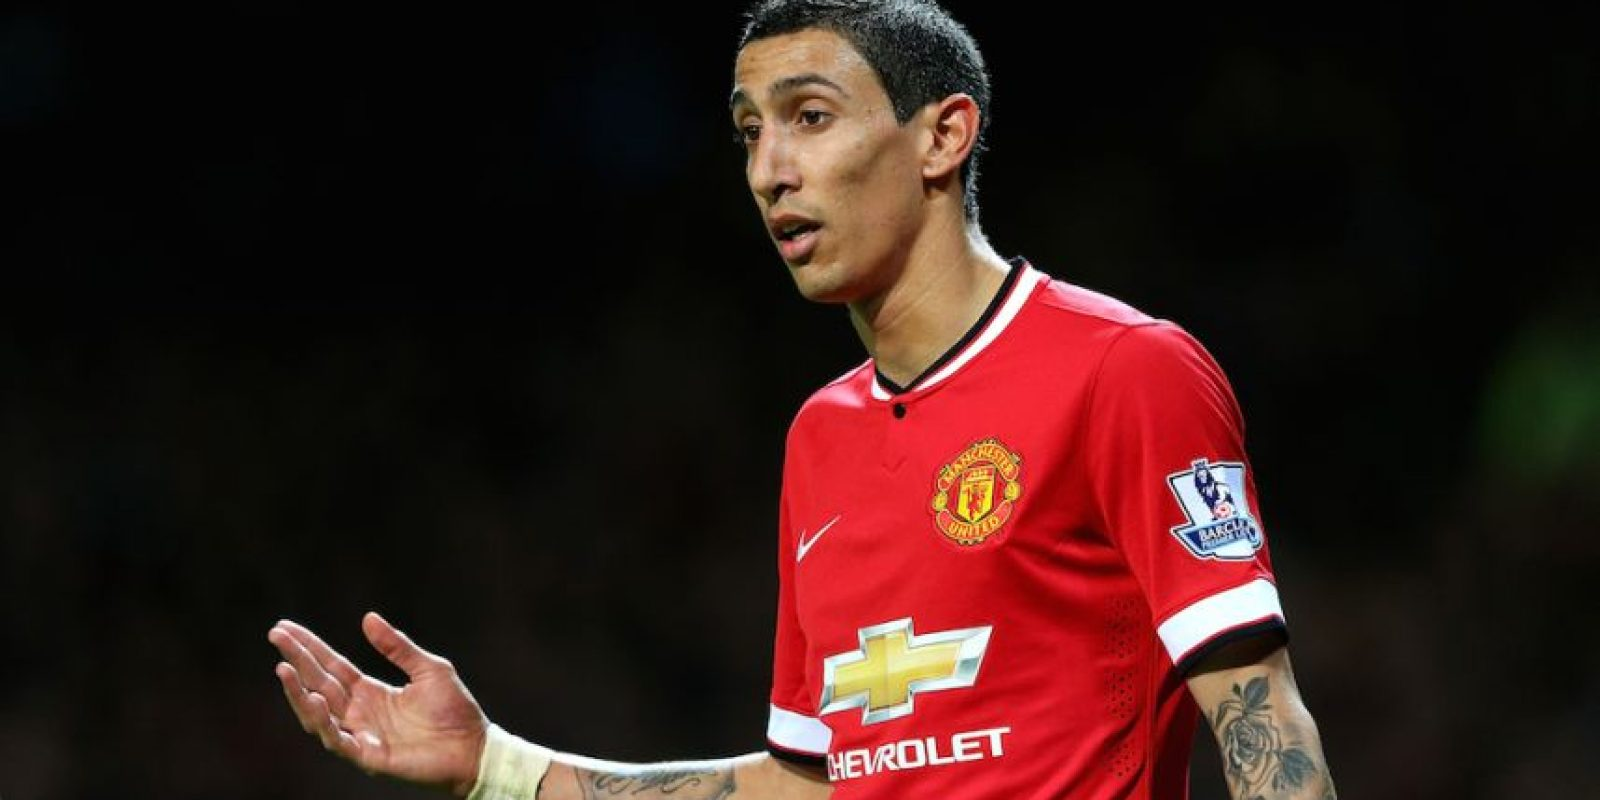 El argentino de 26 años de edad llegó al Manchester United inglés del Real Madrid de España. Foto:Getty Images